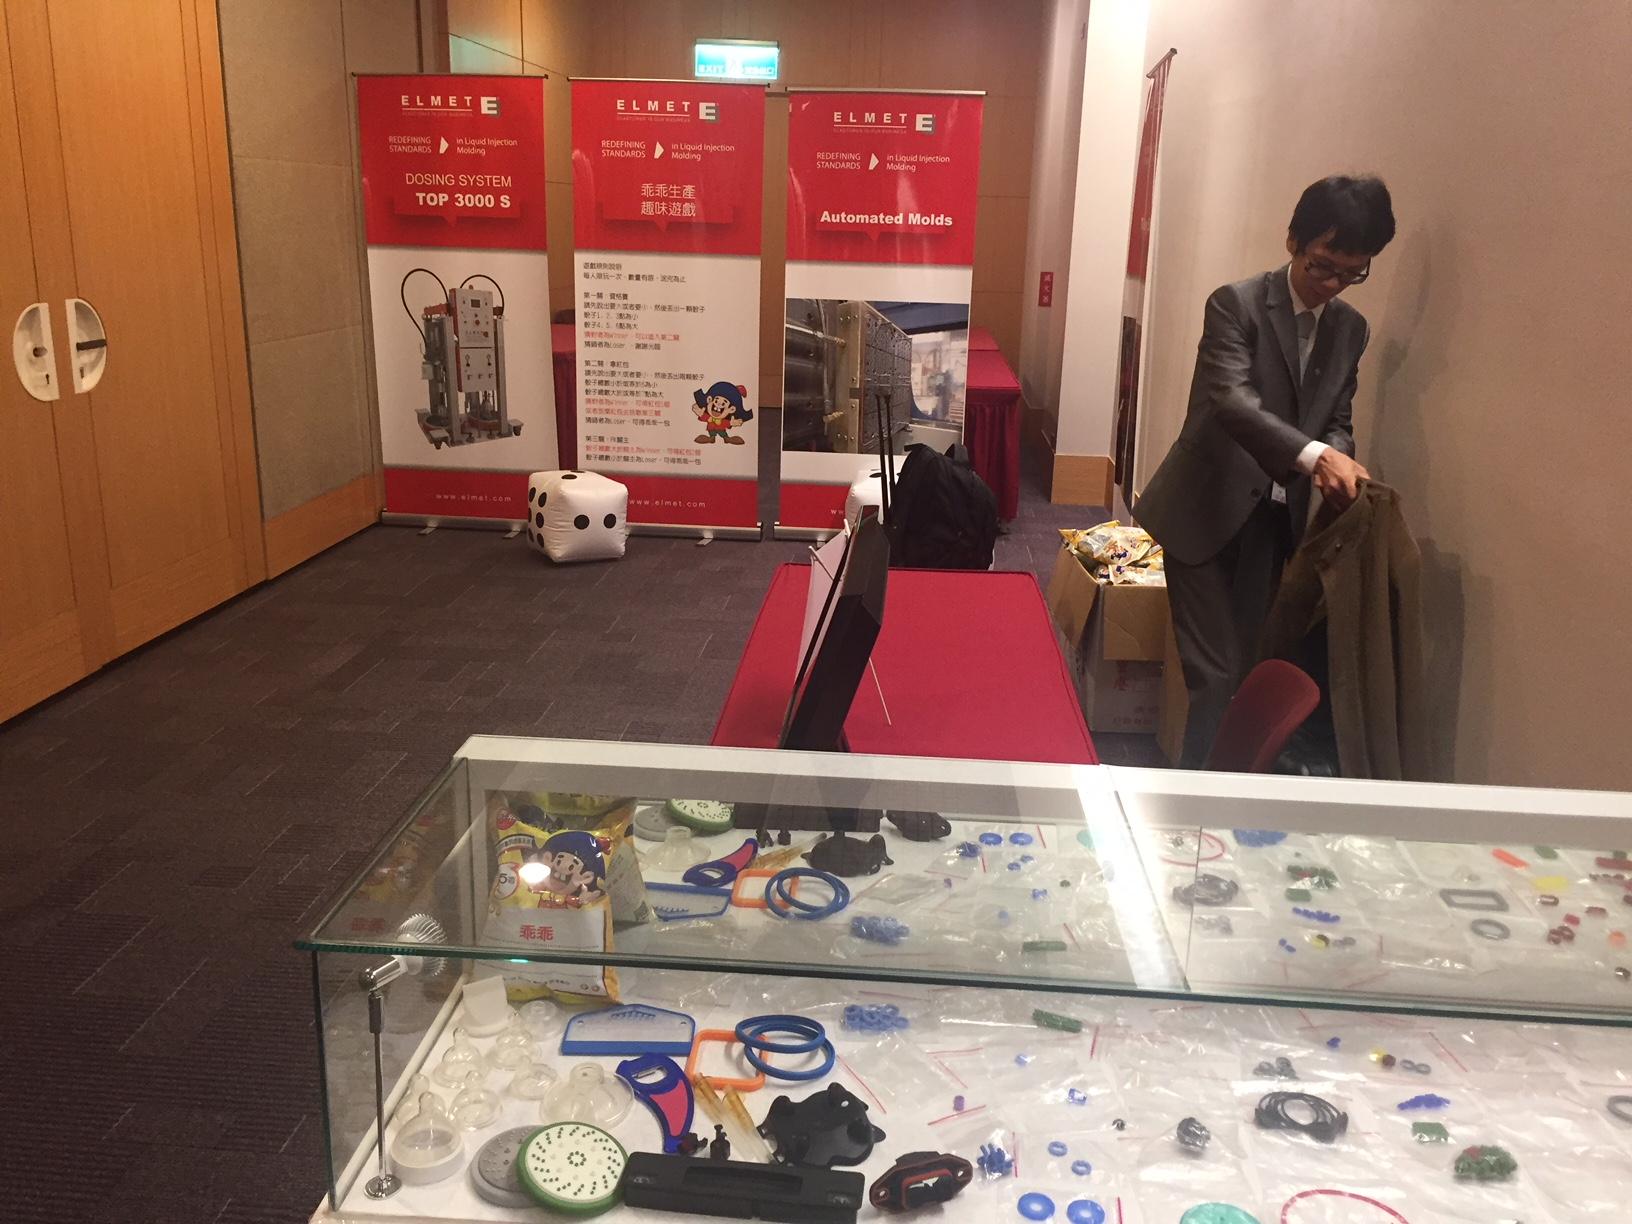 LSR injection molding fairs & conferences worldwide! - Elmet